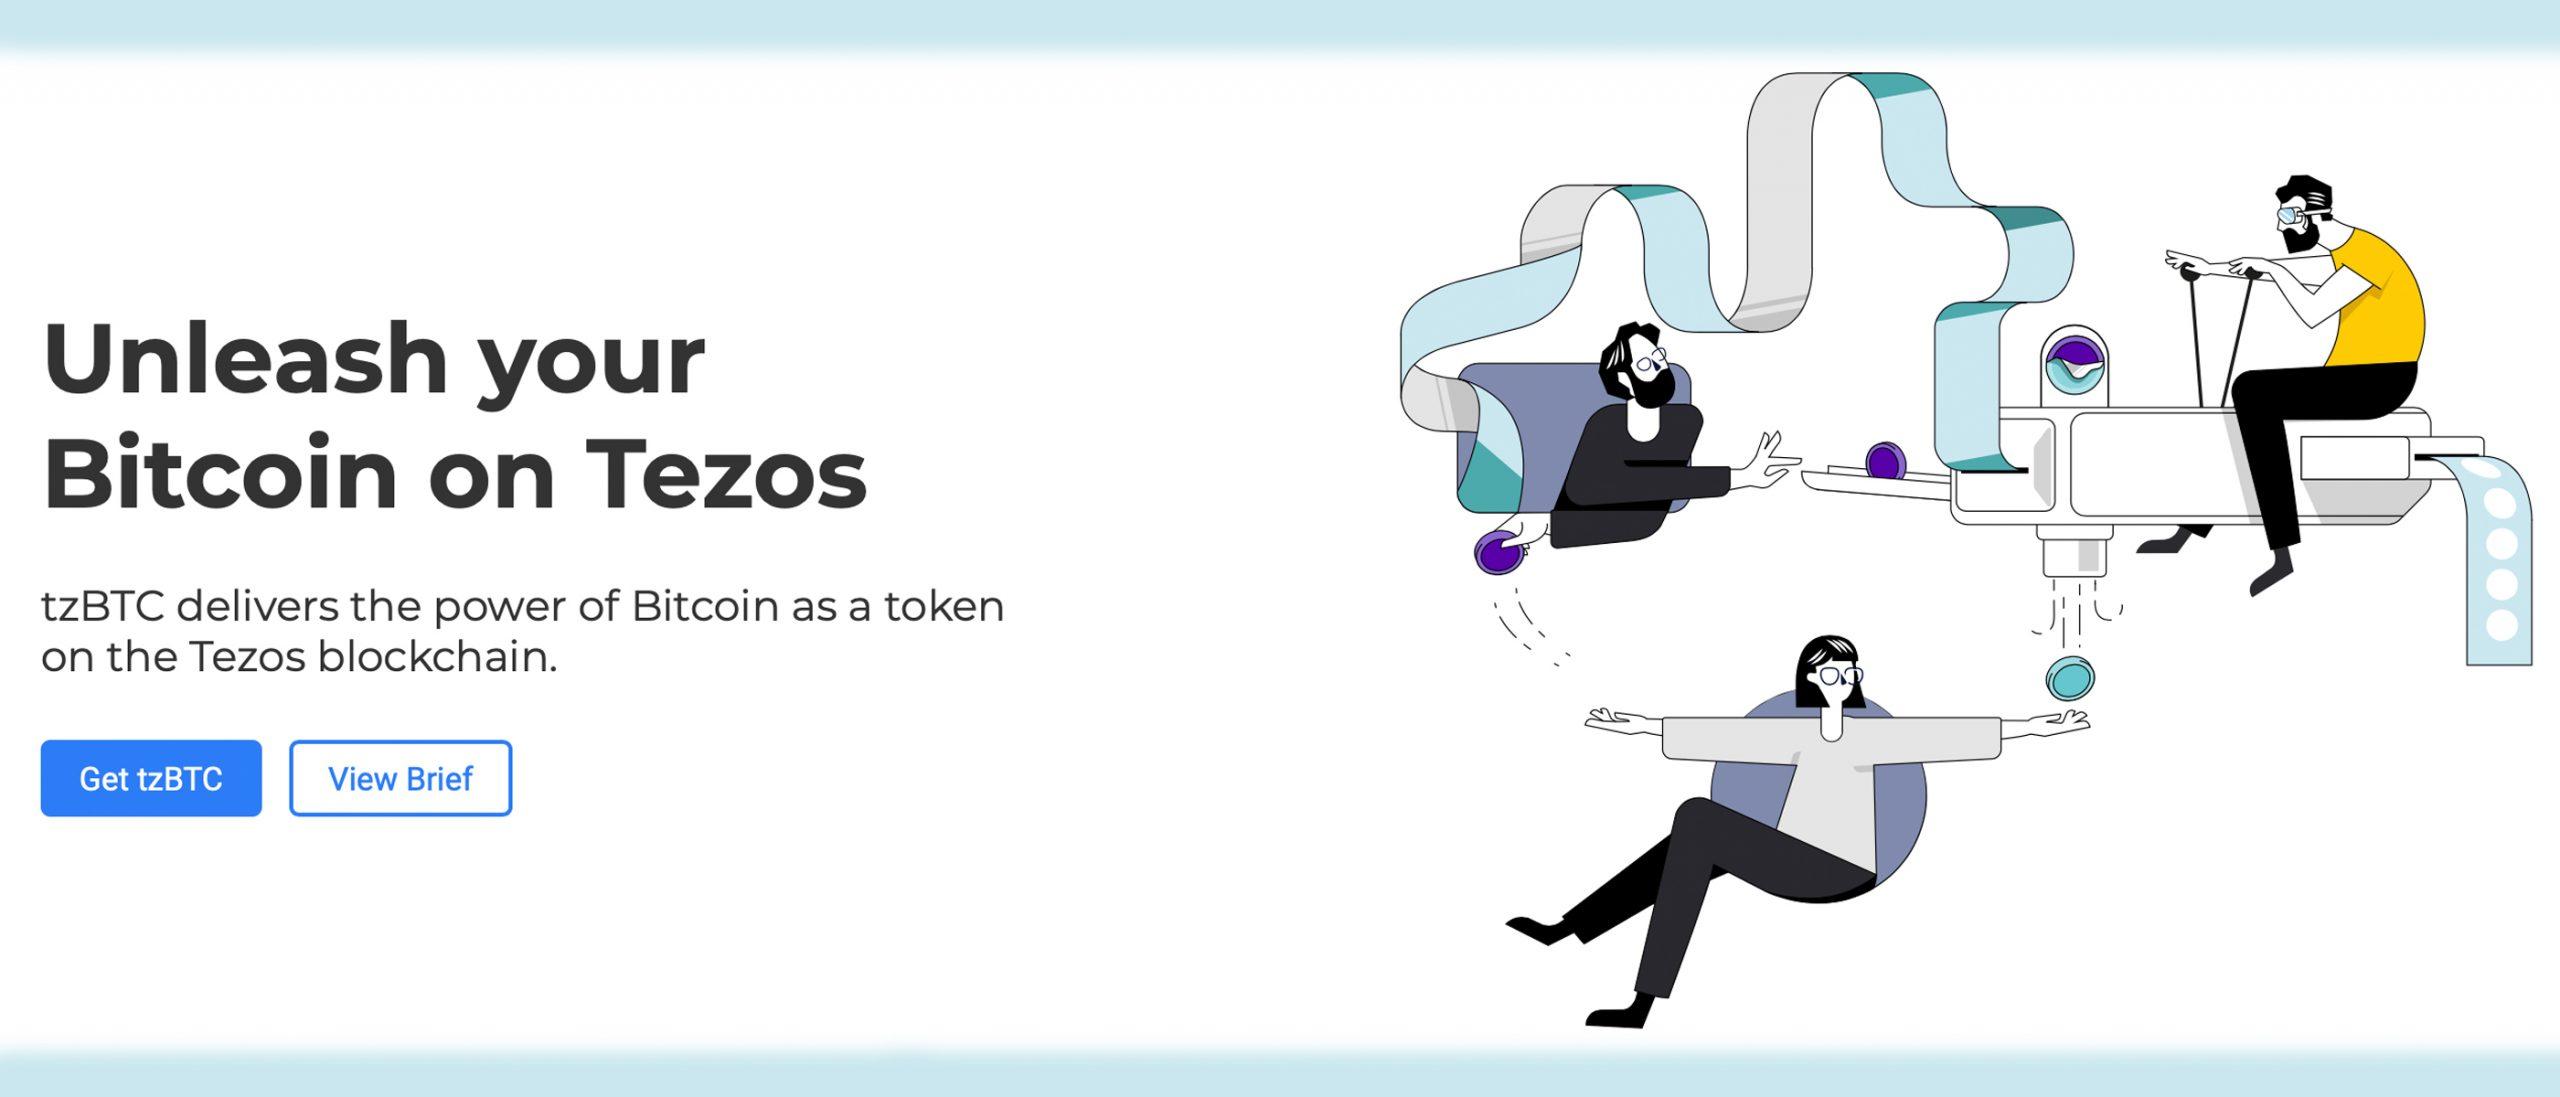 "La nueva plataforma de Bitcoin envuelta le permite realizar transacciones en BTC usando Tezos ""ancho = ""2560"" height = ""1097"" srcset = ""https://blackswanfinances.com/wp-content/uploads/2020/04/tezossddd-scaled.jpg 2560w, https://news.bitcoin.com/wp- content / uploads / 2020/04 / tezossddd-300x129.jpg 300w, https://news.bitcoin.com/wp-content/uploads/2020/04/tezossddd-1024x439.jpg 1024w, https: //news.bitcoin. com / wp-content / uploads / 2020/04 / tezossddd-768x329.jpg 768w, https://news.bitcoin.com/wp-content/uploads/2020/04/tezossddd-1536x658.jpg 1536w, https: // news.bitcoin.com/wp-content/uploads/2020/04/tezossddd-2048x878.jpg 2048w, https://news.bitcoin.com/wp-content/uploads/2020/04/tezossddd-696x298.jpg 696w, https://news.bitcoin.com/wp-content/uploads/2020/04/tezossddd-1392x597.jpg 1392w, https://news.bitcoin.com/wp-content/uploads/2020/04/tezossddd-1068x458 .jpg 1 068w, https://news.bitcoin.com/wp-content/uploads/2020/04/tezossddd-980x420.jpg 980w, https://news.bitcoin.com/wp-content/uploads/2020/04/tezossddd -1920x823.jpg 1920w ""tamaños ="" (ancho máximo: 2560px) 100vw, 2560px"